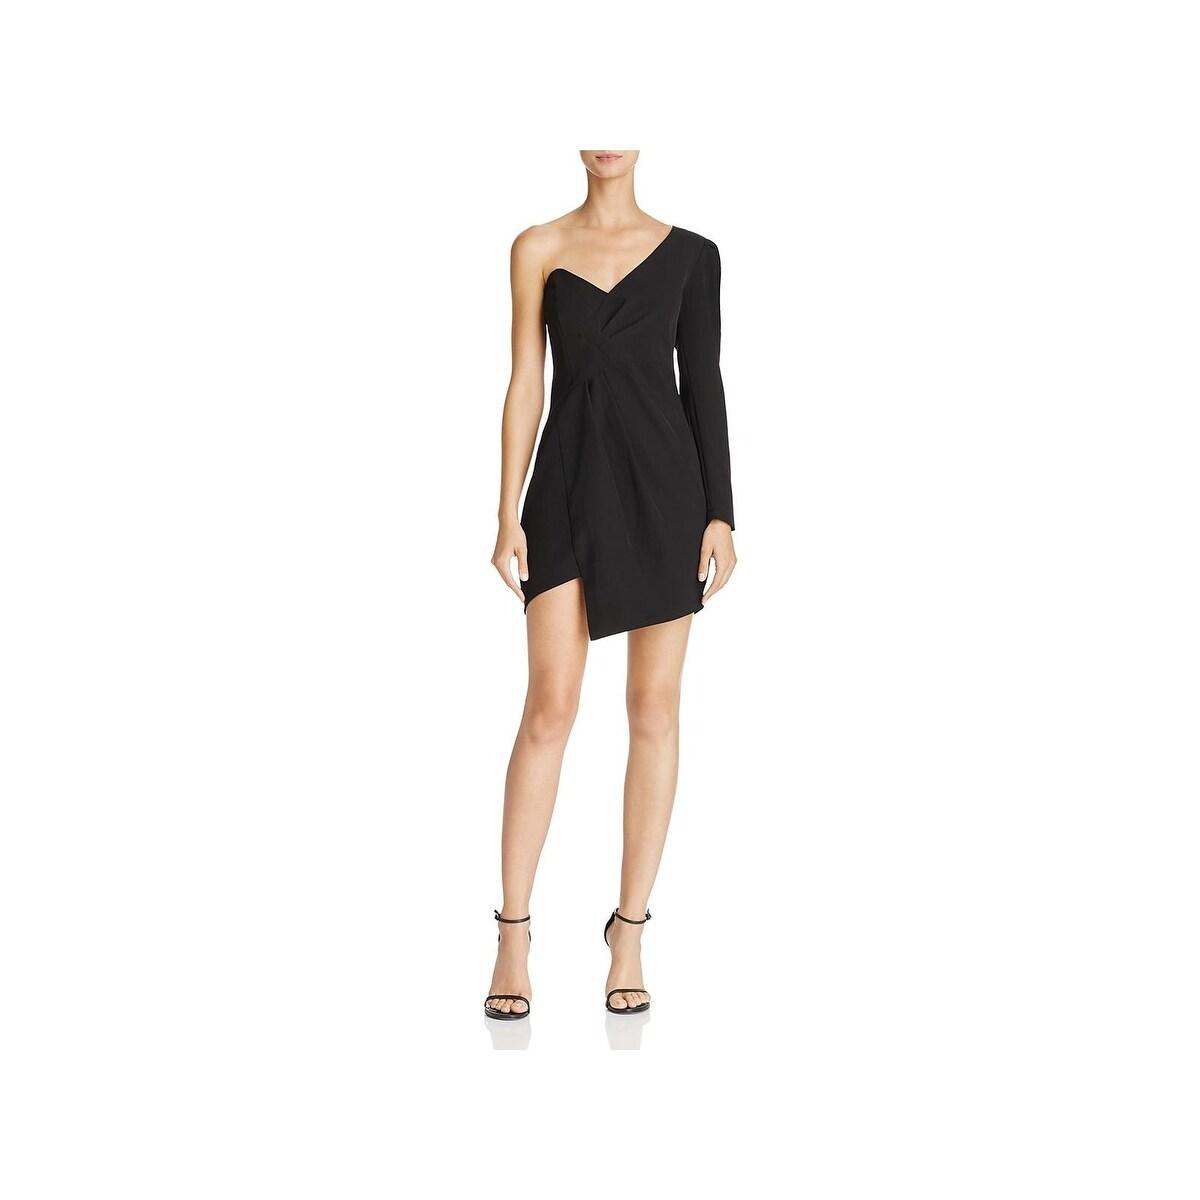 c2085b09f0 Shop Bardot Womens Anja Cocktail Dress One Shoulder Mini - Free ...